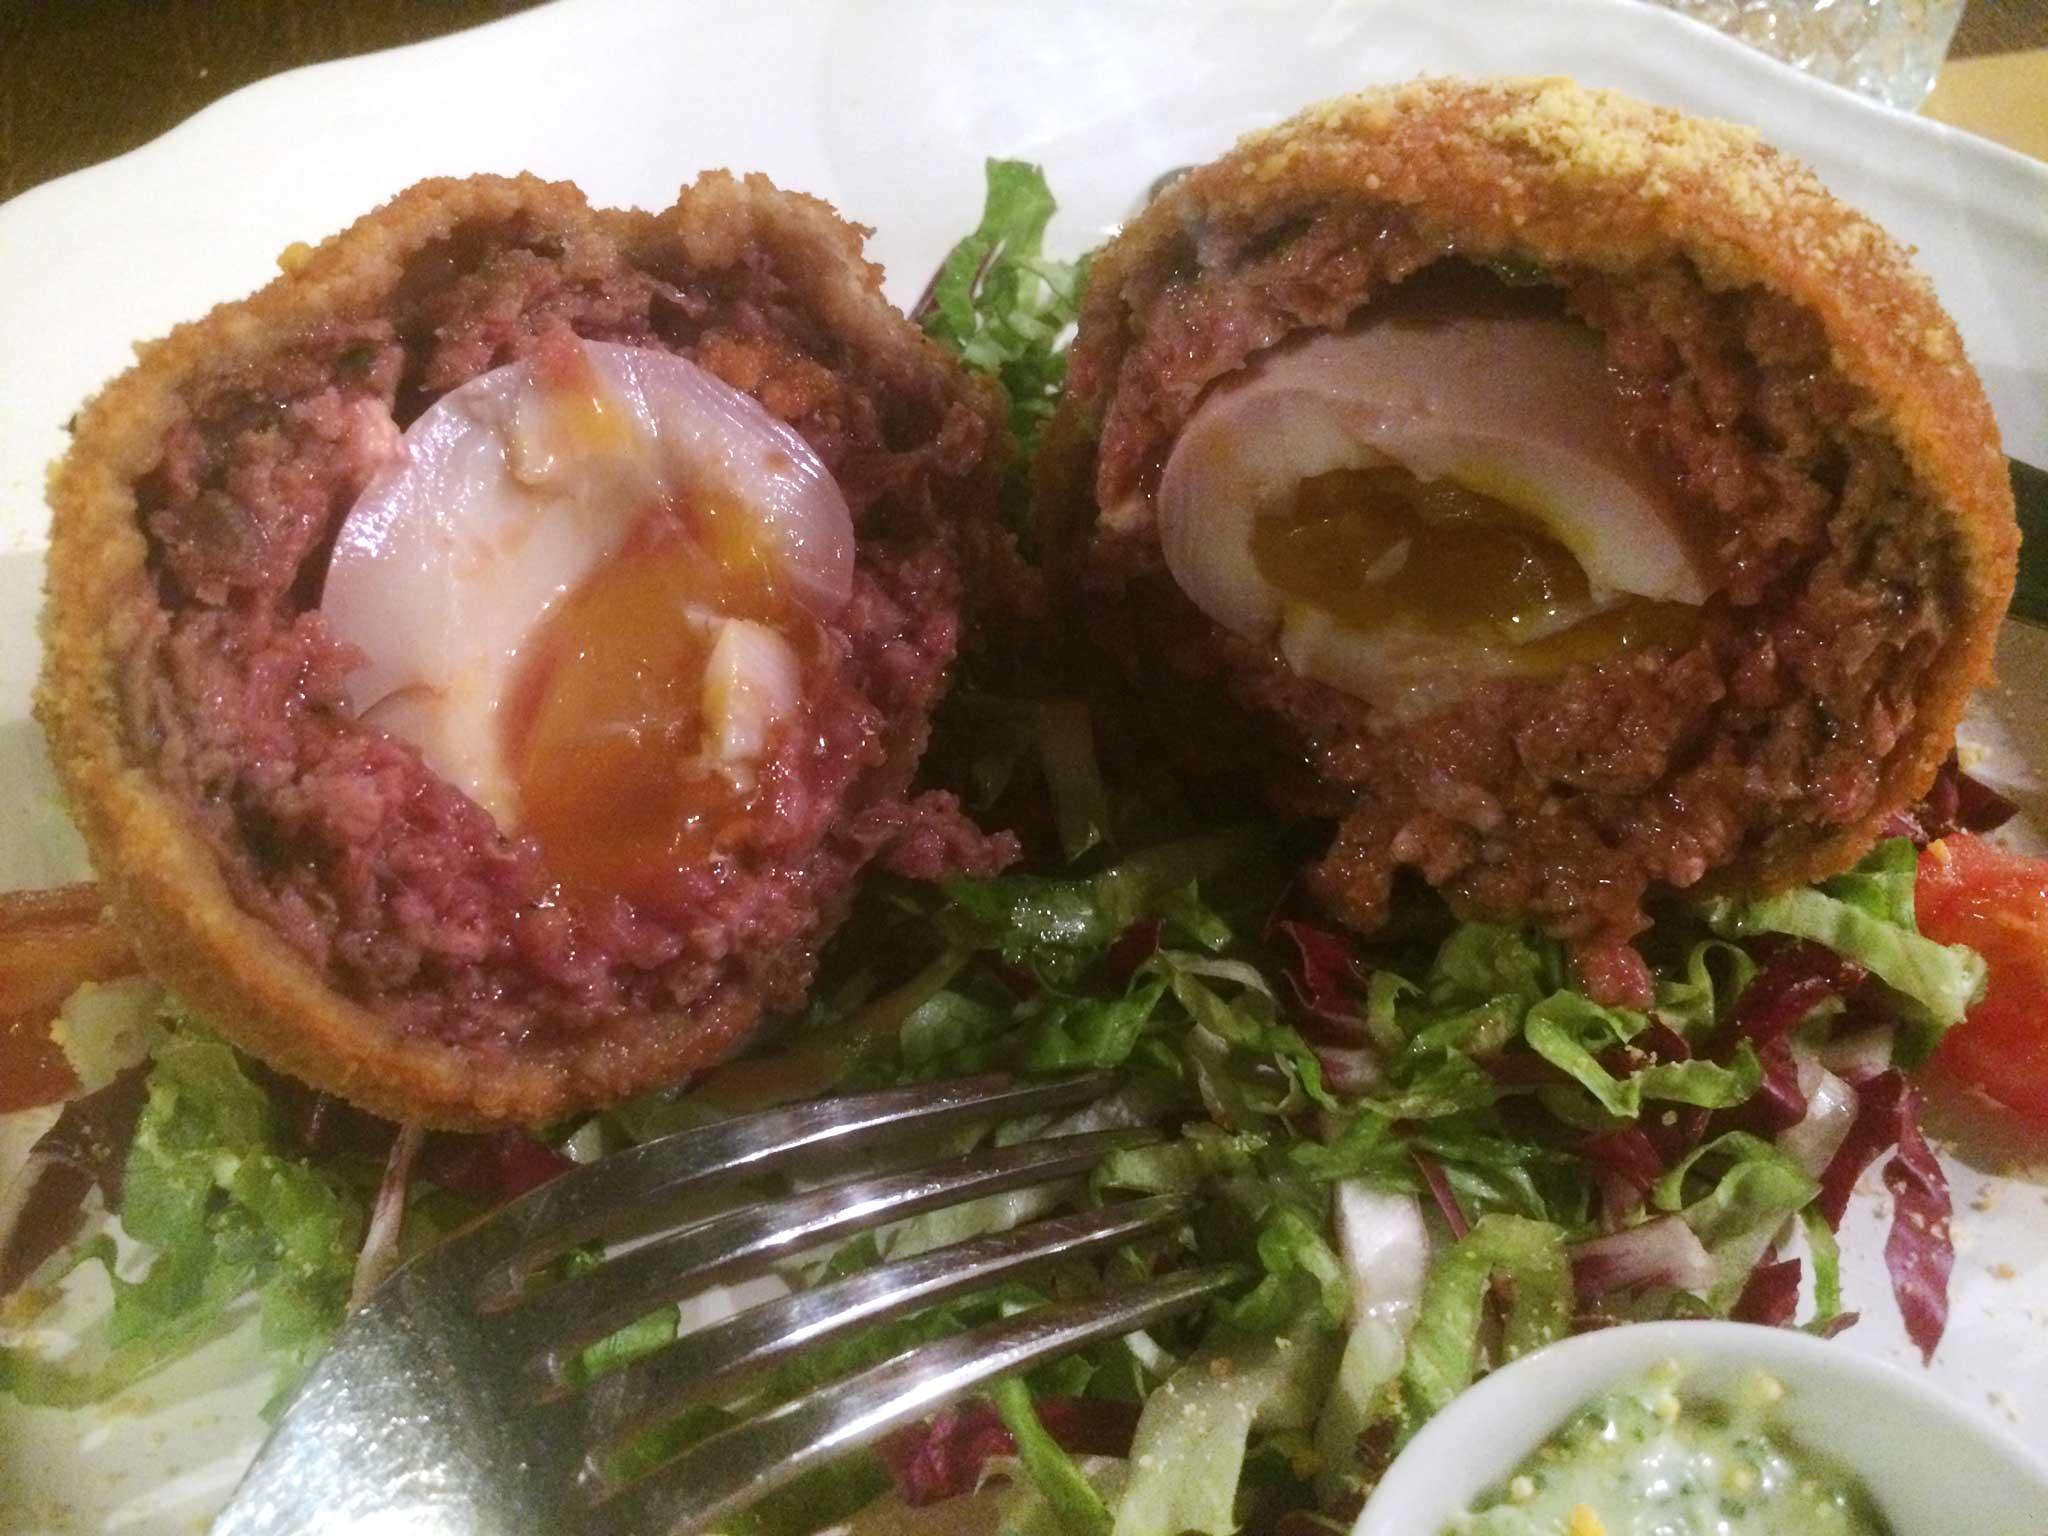 uovo e carne